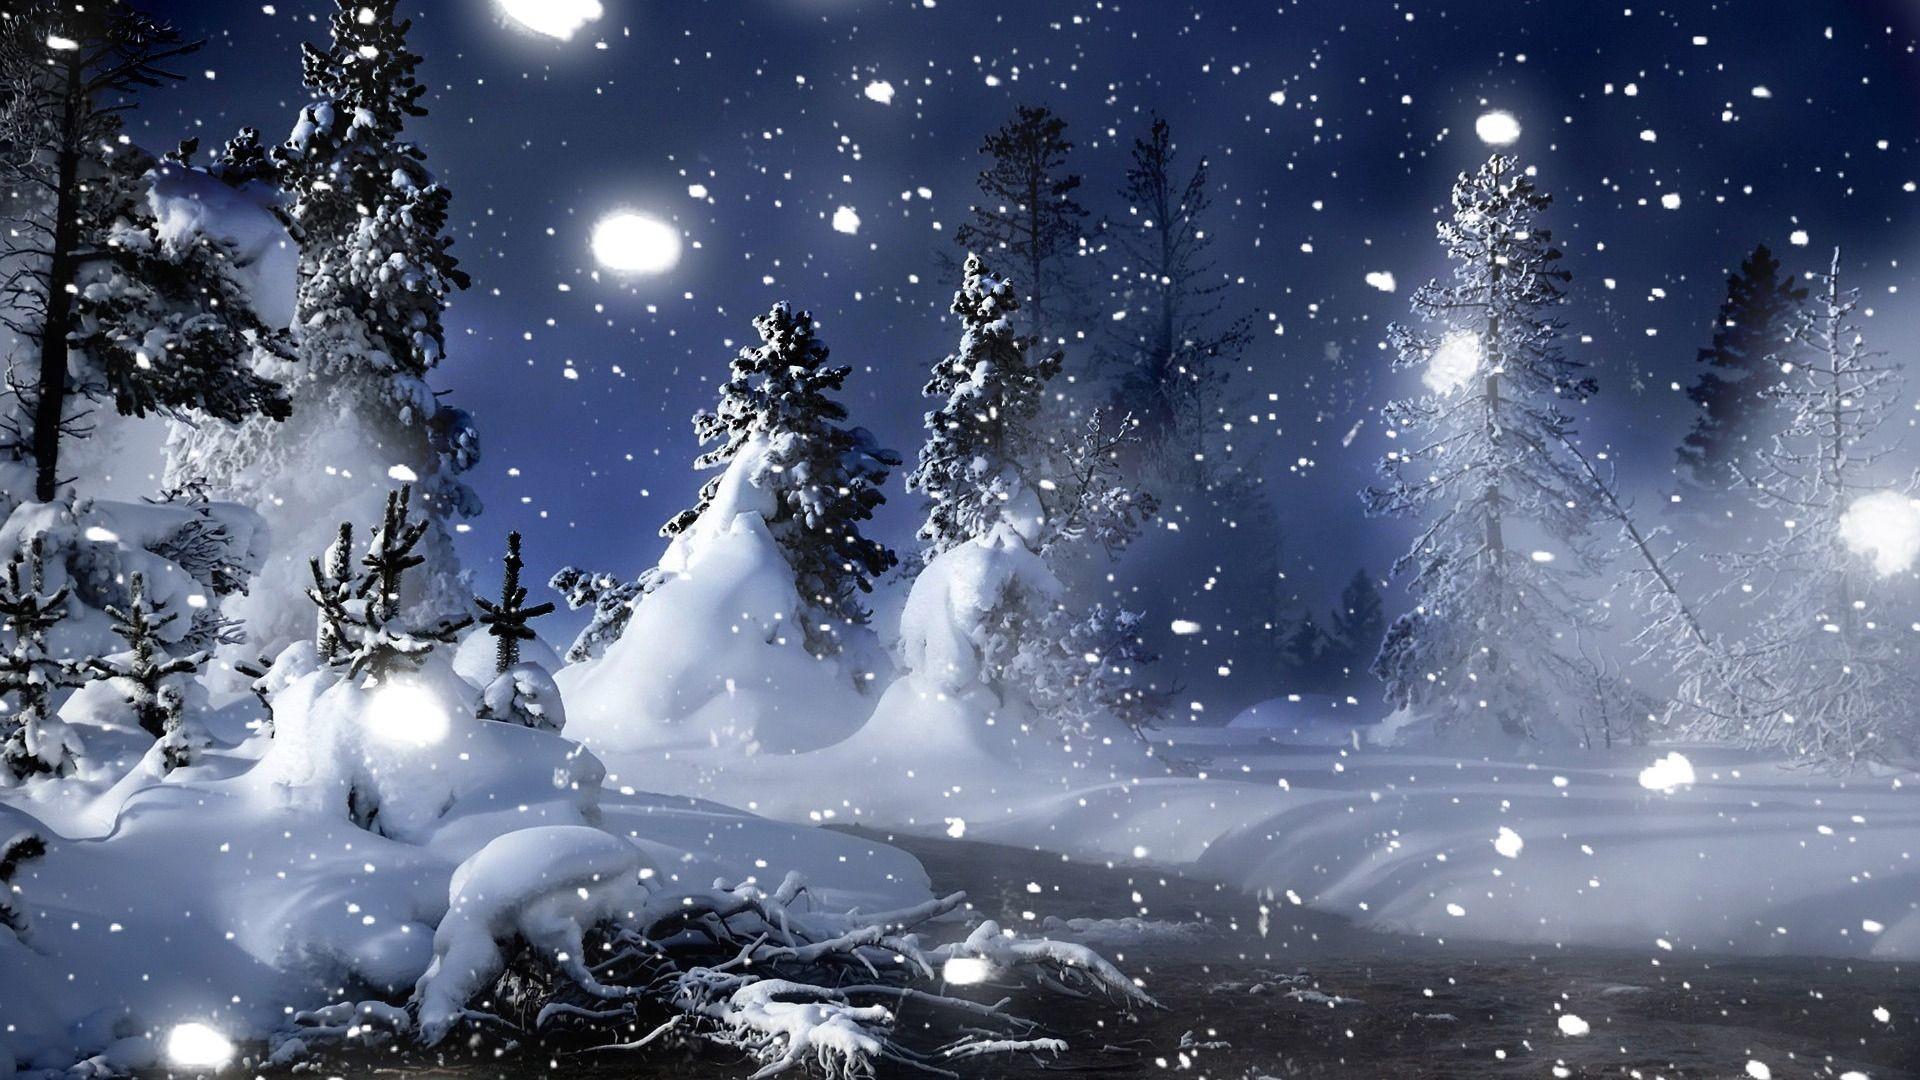 Winter Snow – Wallpaper, High Definition, High Quality, Widescreen